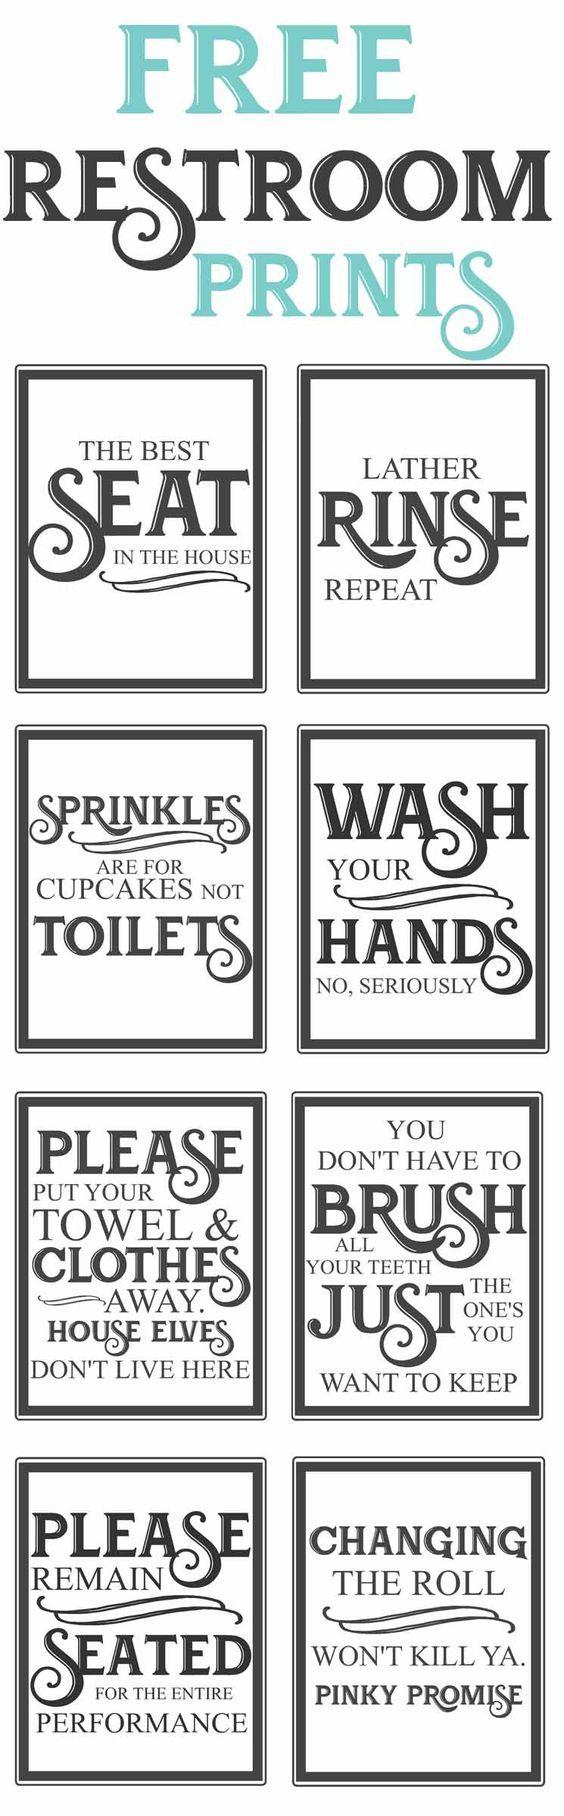 Free Vintage Bathroom Printables | Free Printables | Home Decor, Diy - Free Wash Your Hands Signs Printable